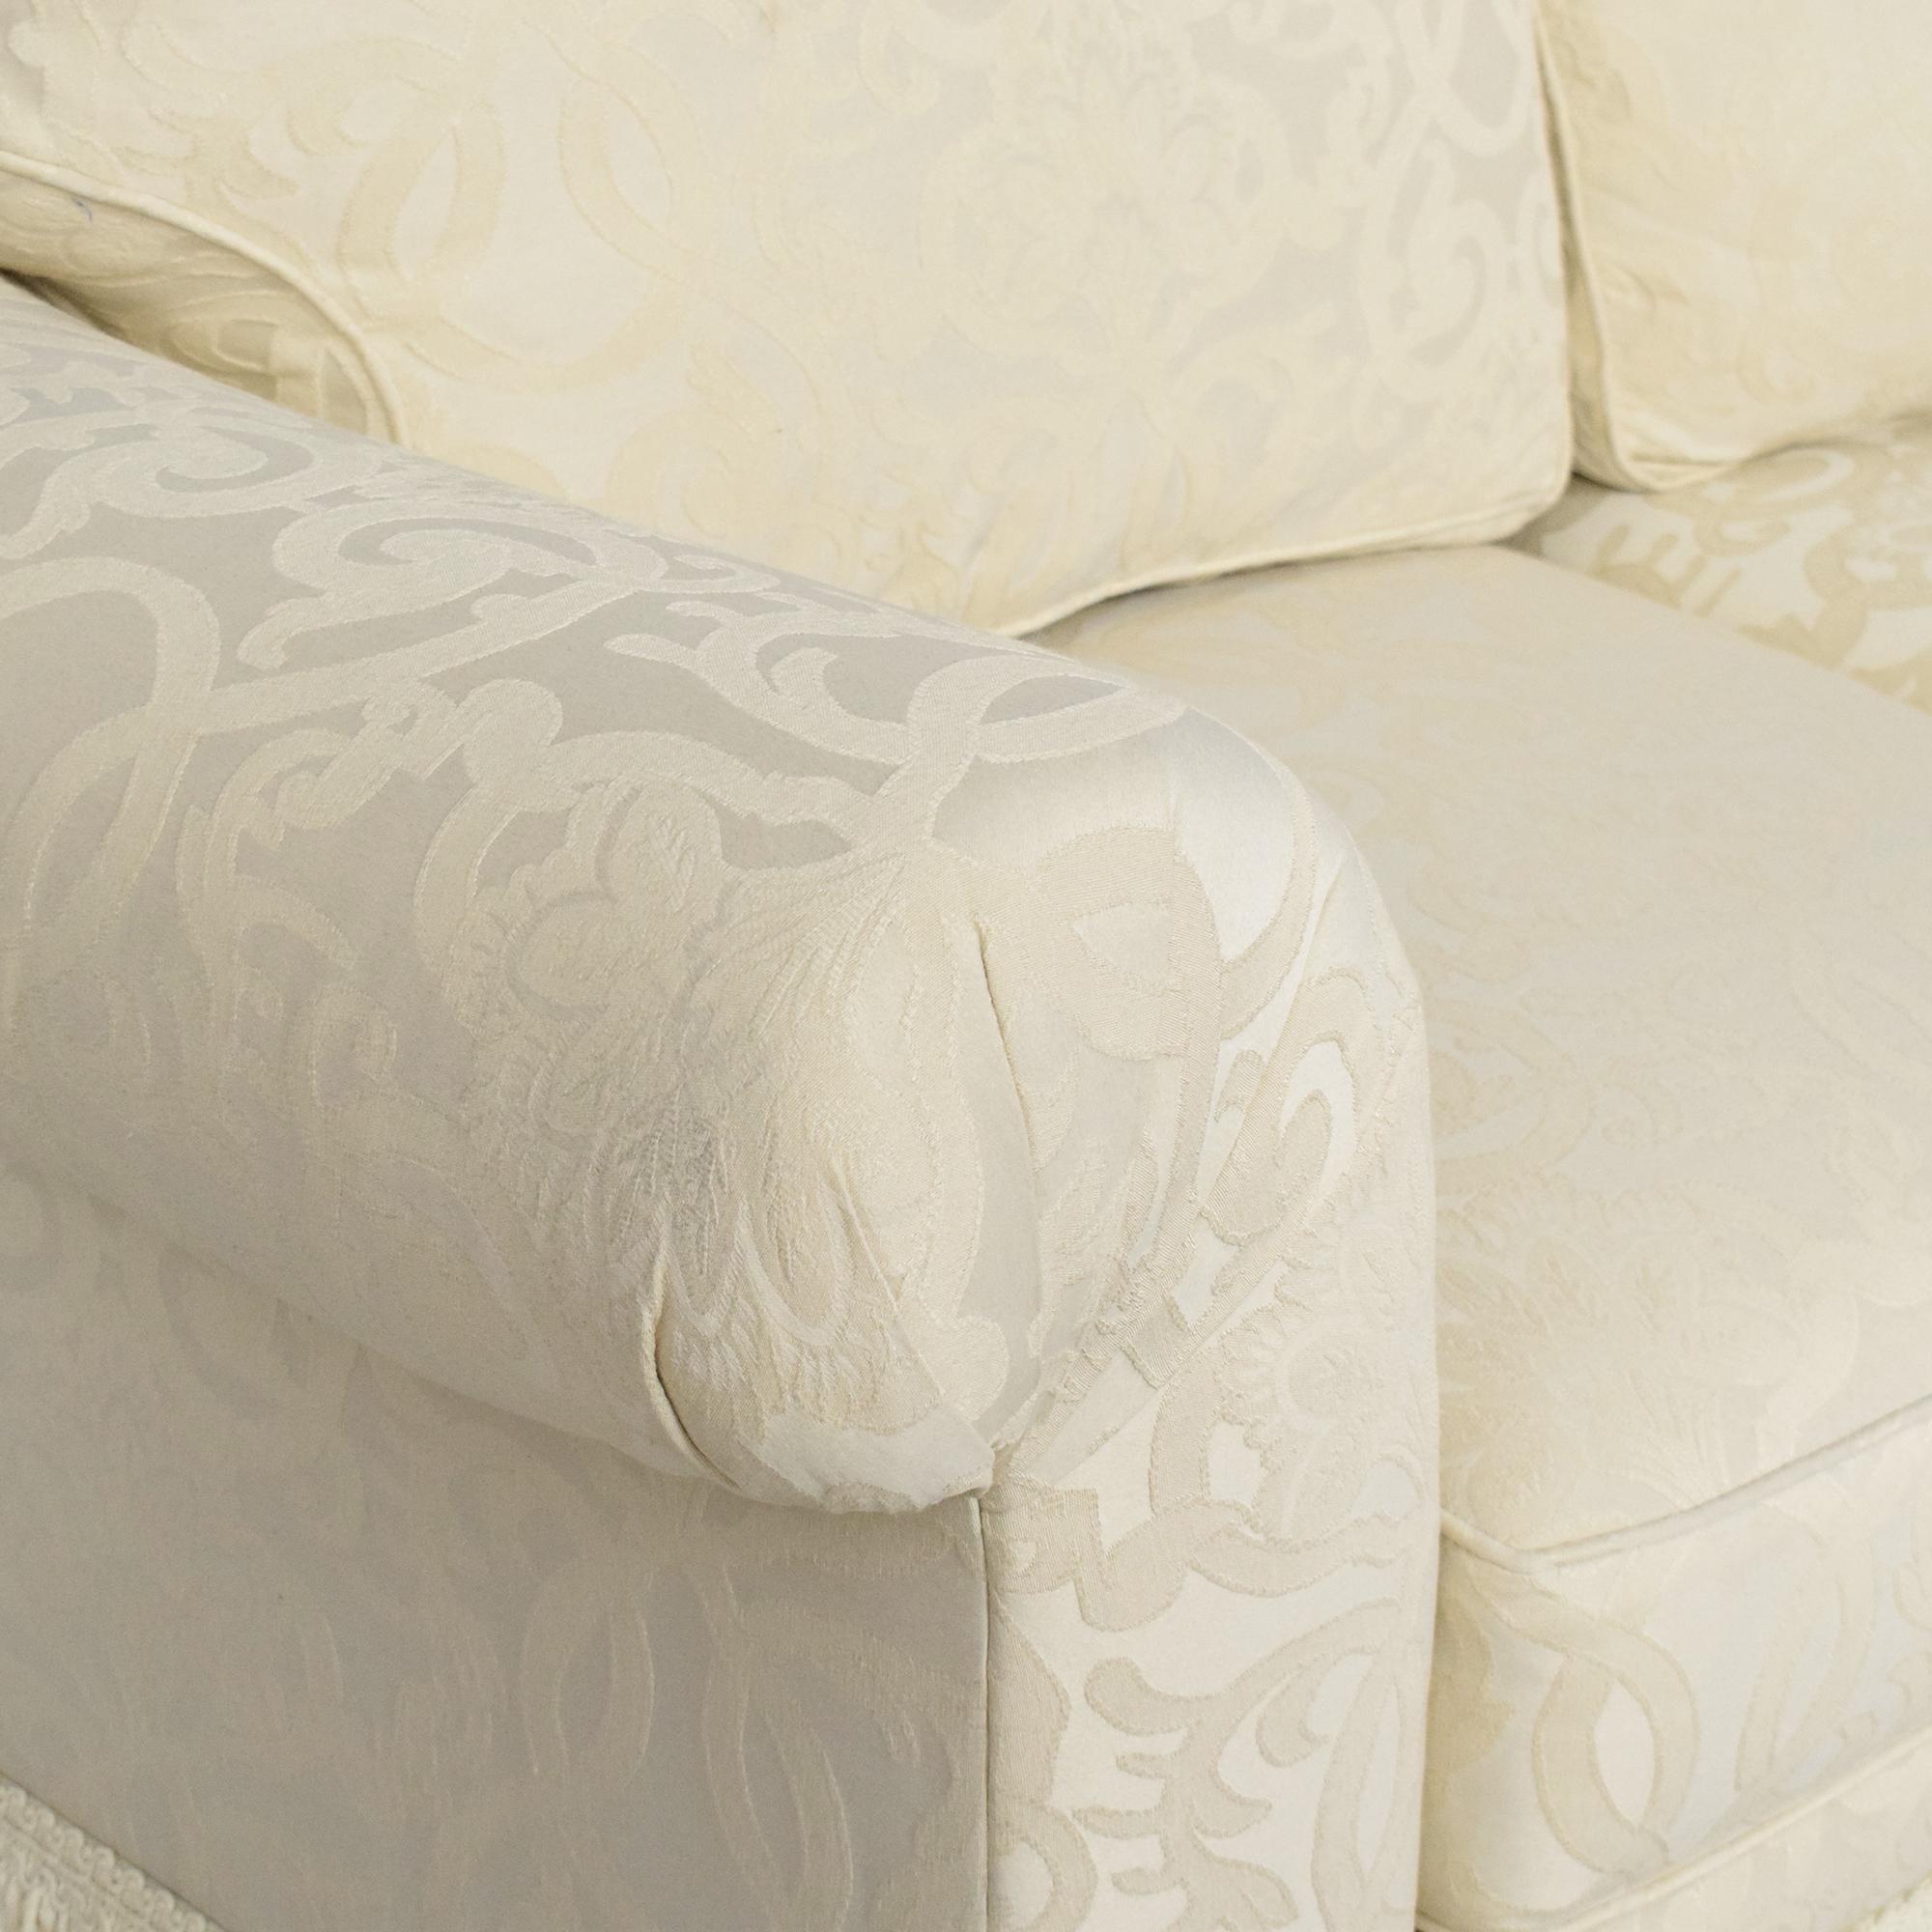 Wesley Hall Wesley Hall Curved Sofa on sale